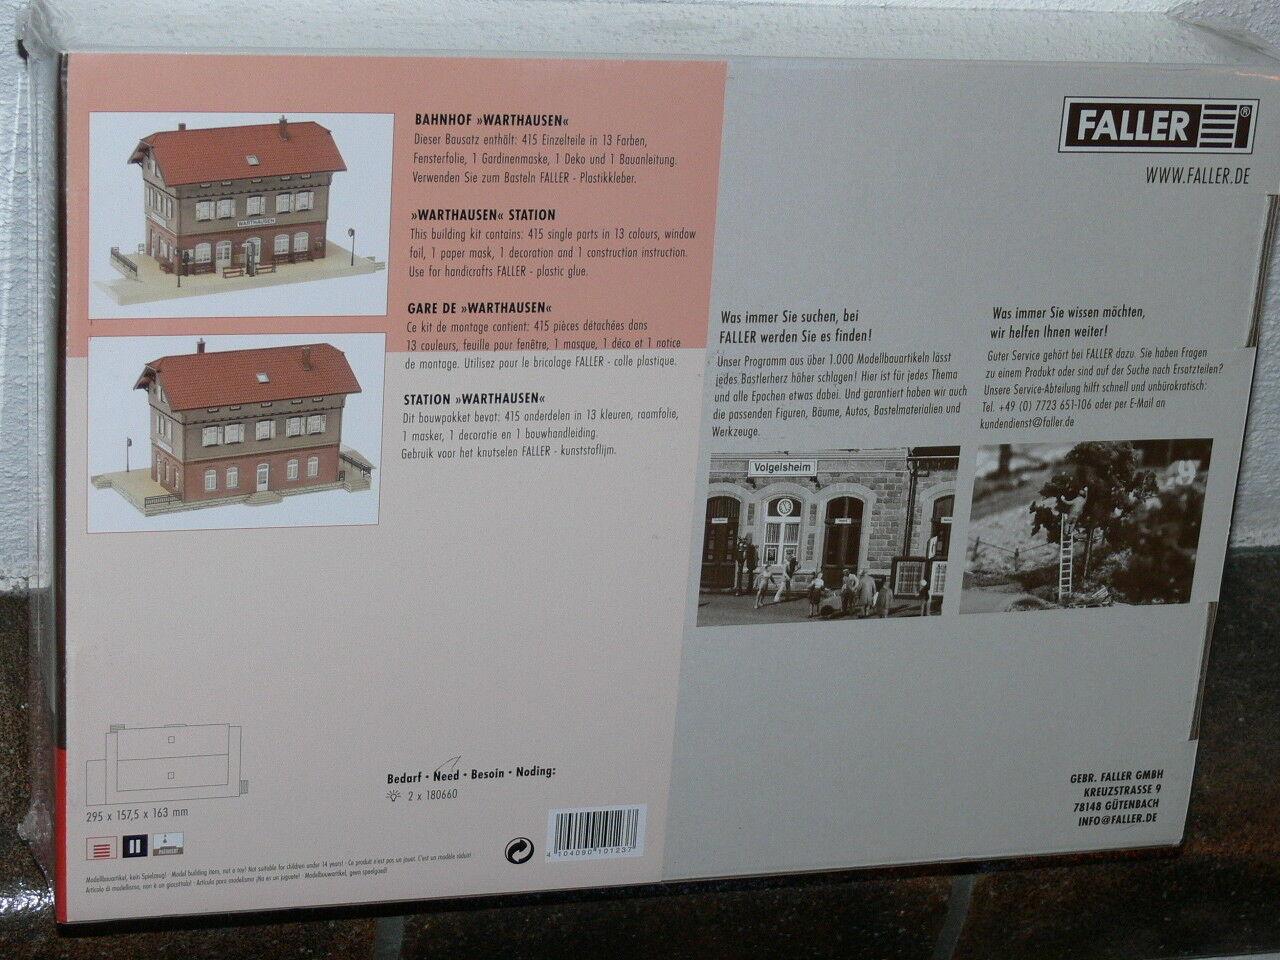 Faller - Bahnhof Warthausen - 1 87 H0 - - - Nr. 110123 - Neu&Ovp -    Niedriger Preis  c01107